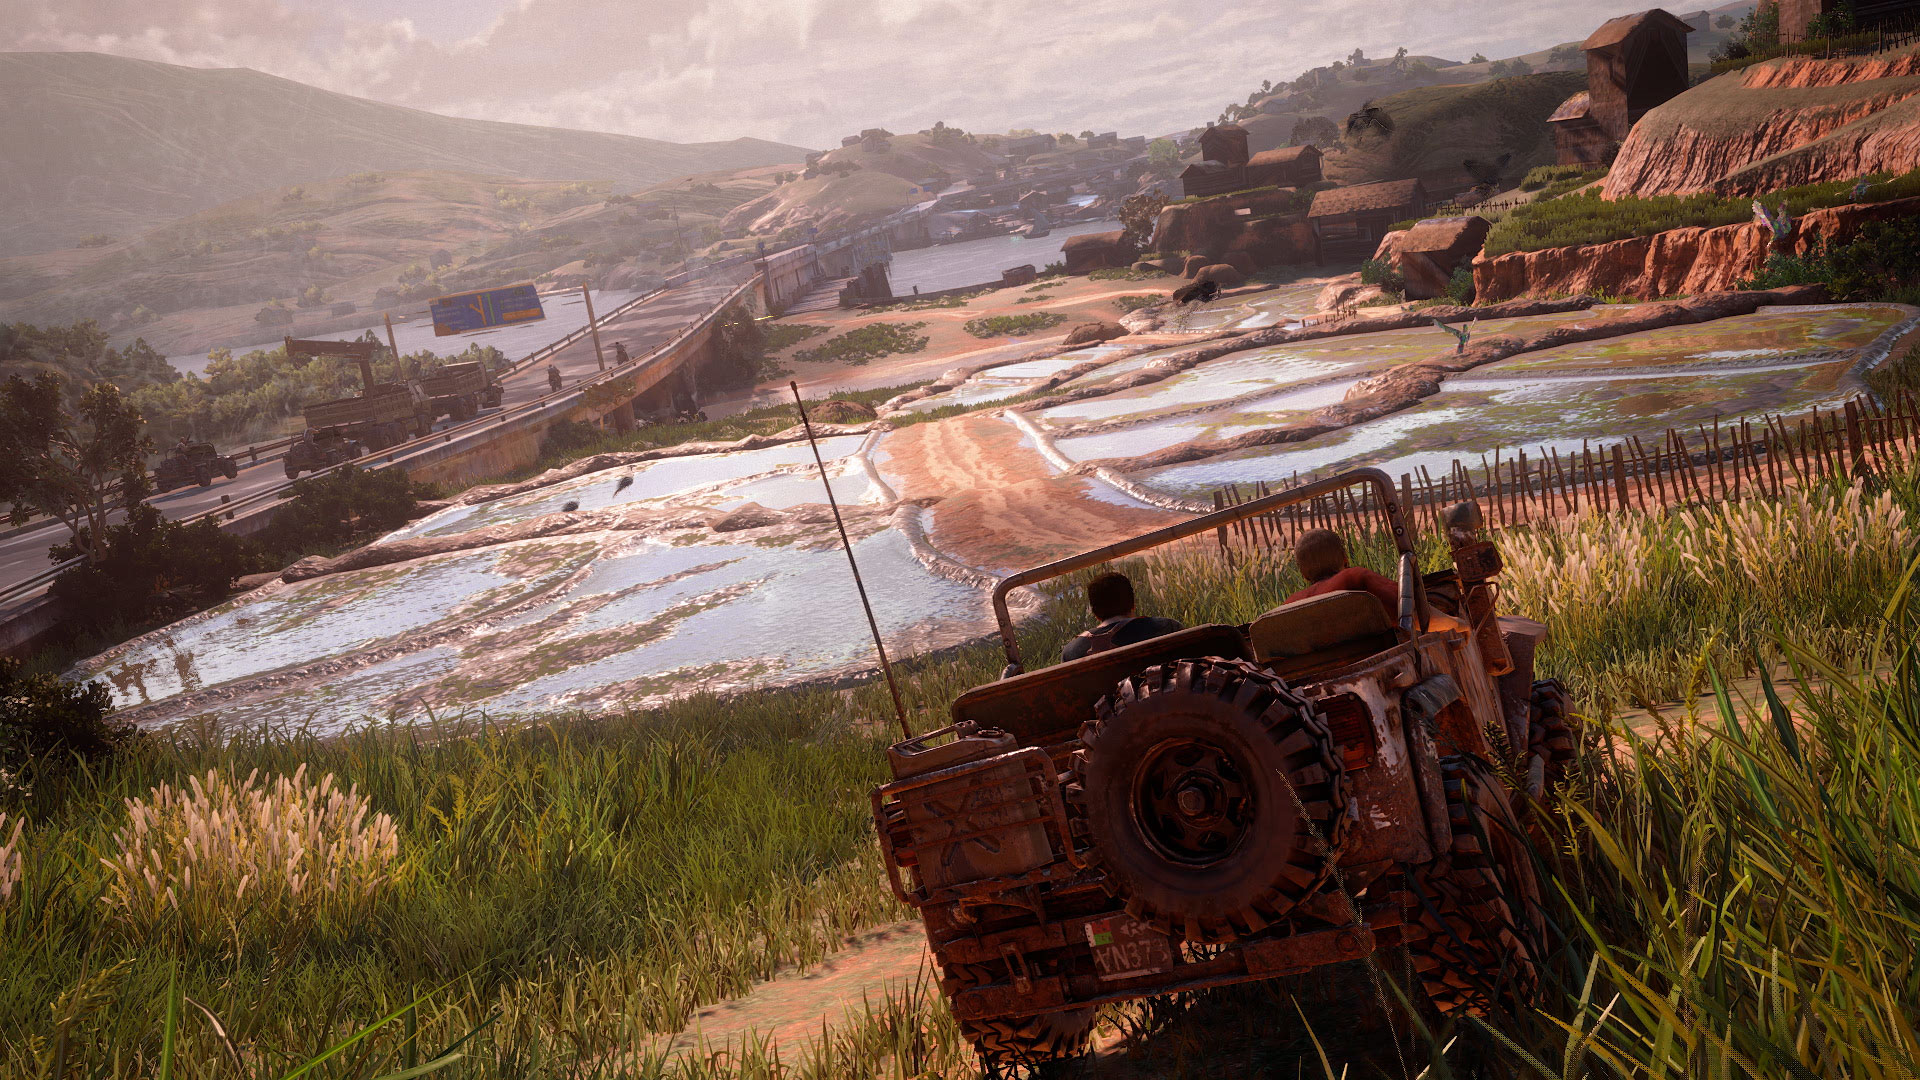 Uncharted4-AThief-sEnd PS4 Editeur 017